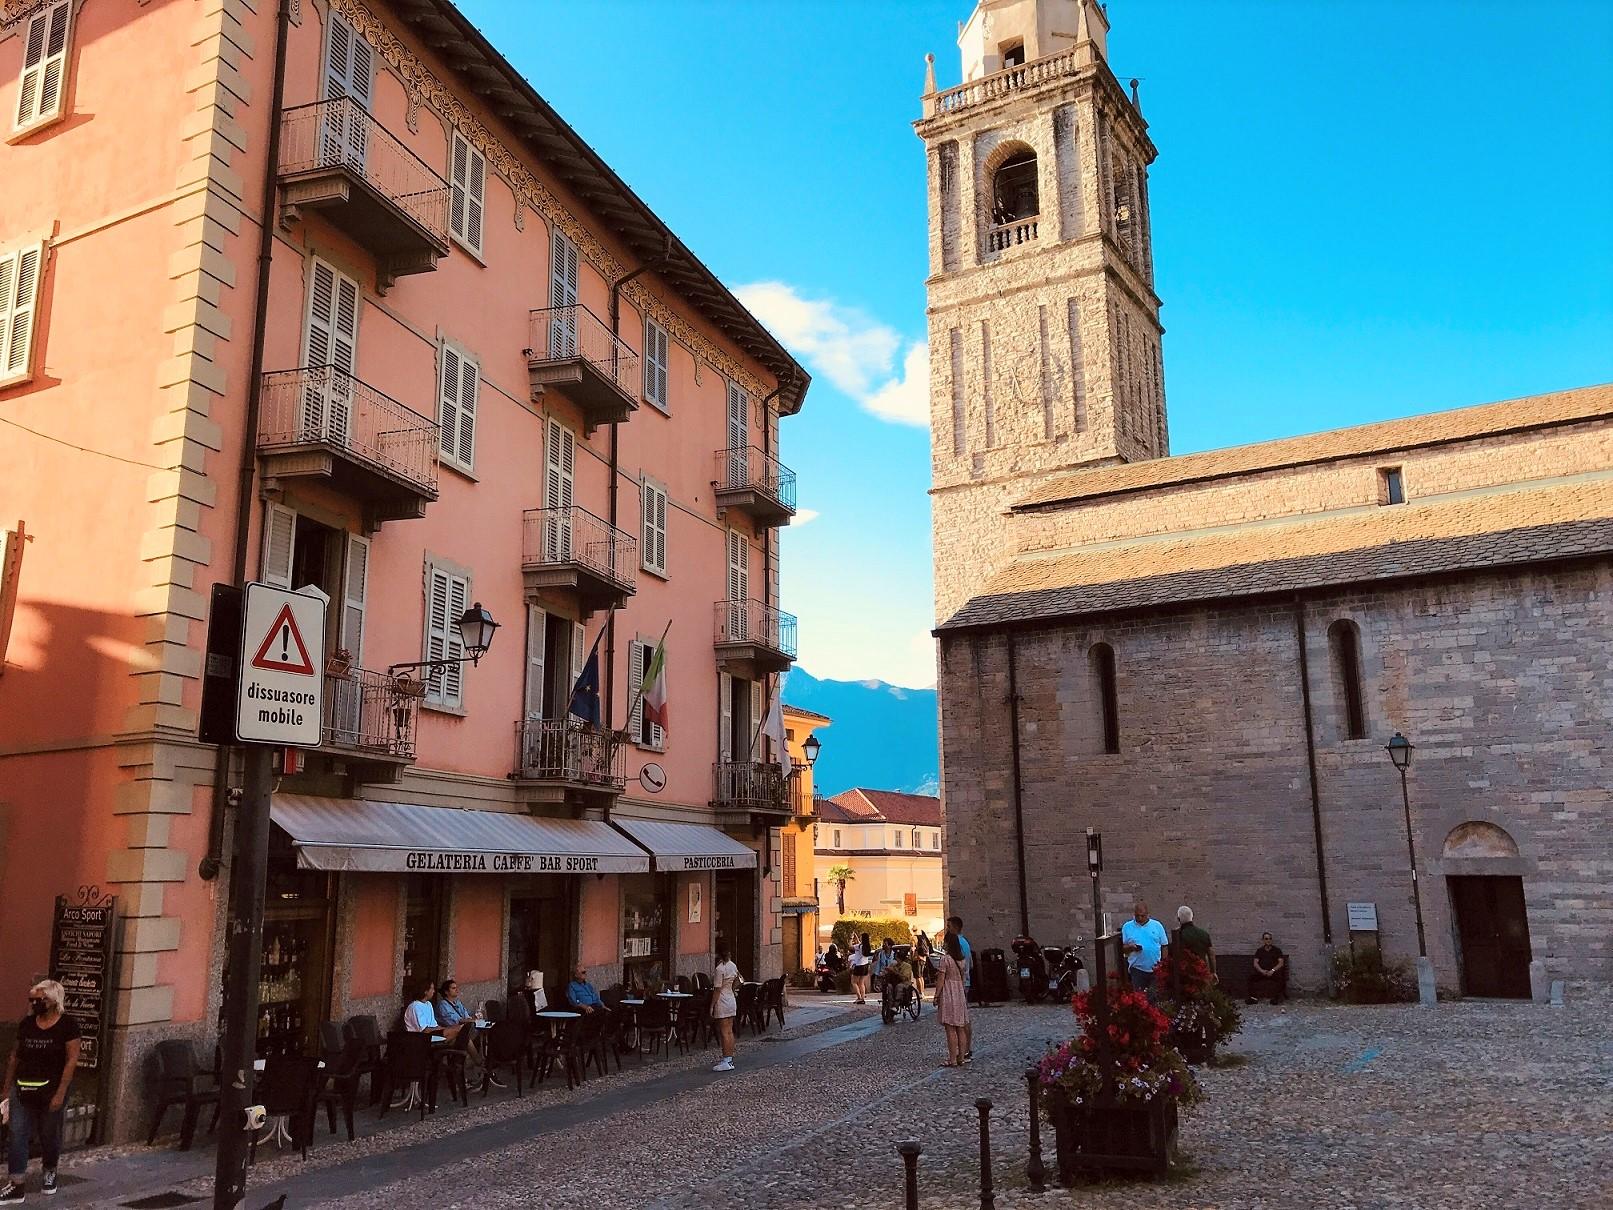 San Giacomo church in Bellagio